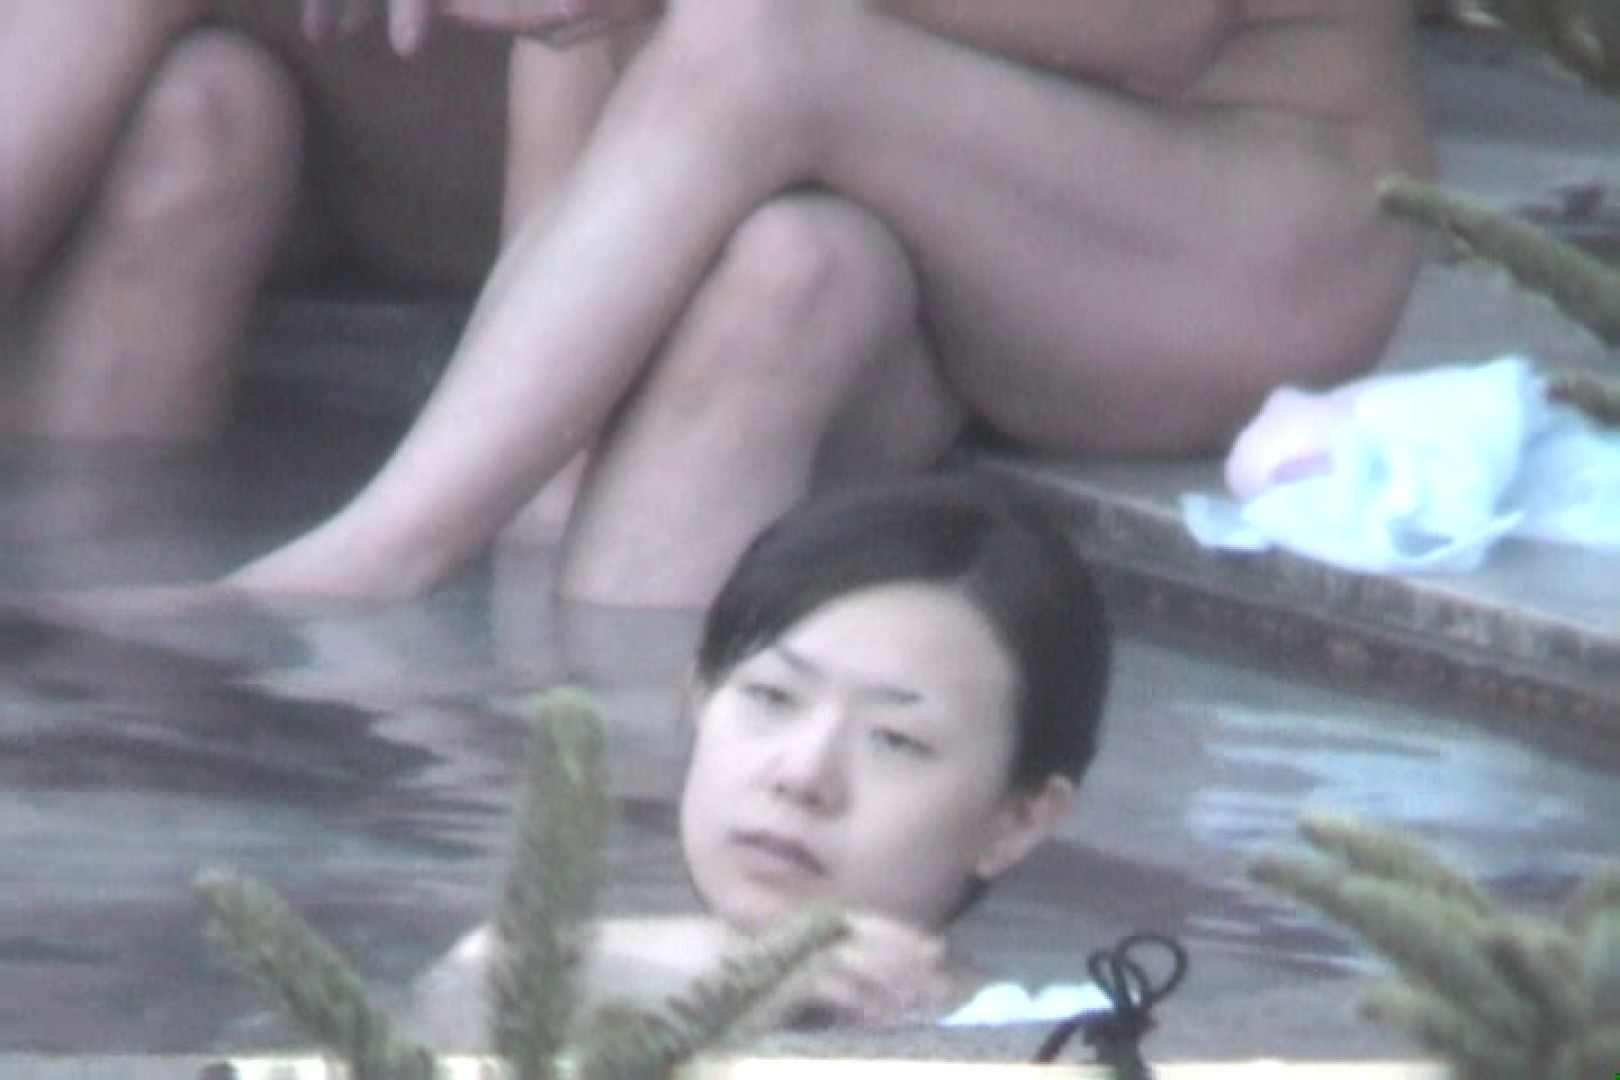 Aquaな露天風呂Vol.609 盗撮映像  58Pix 14